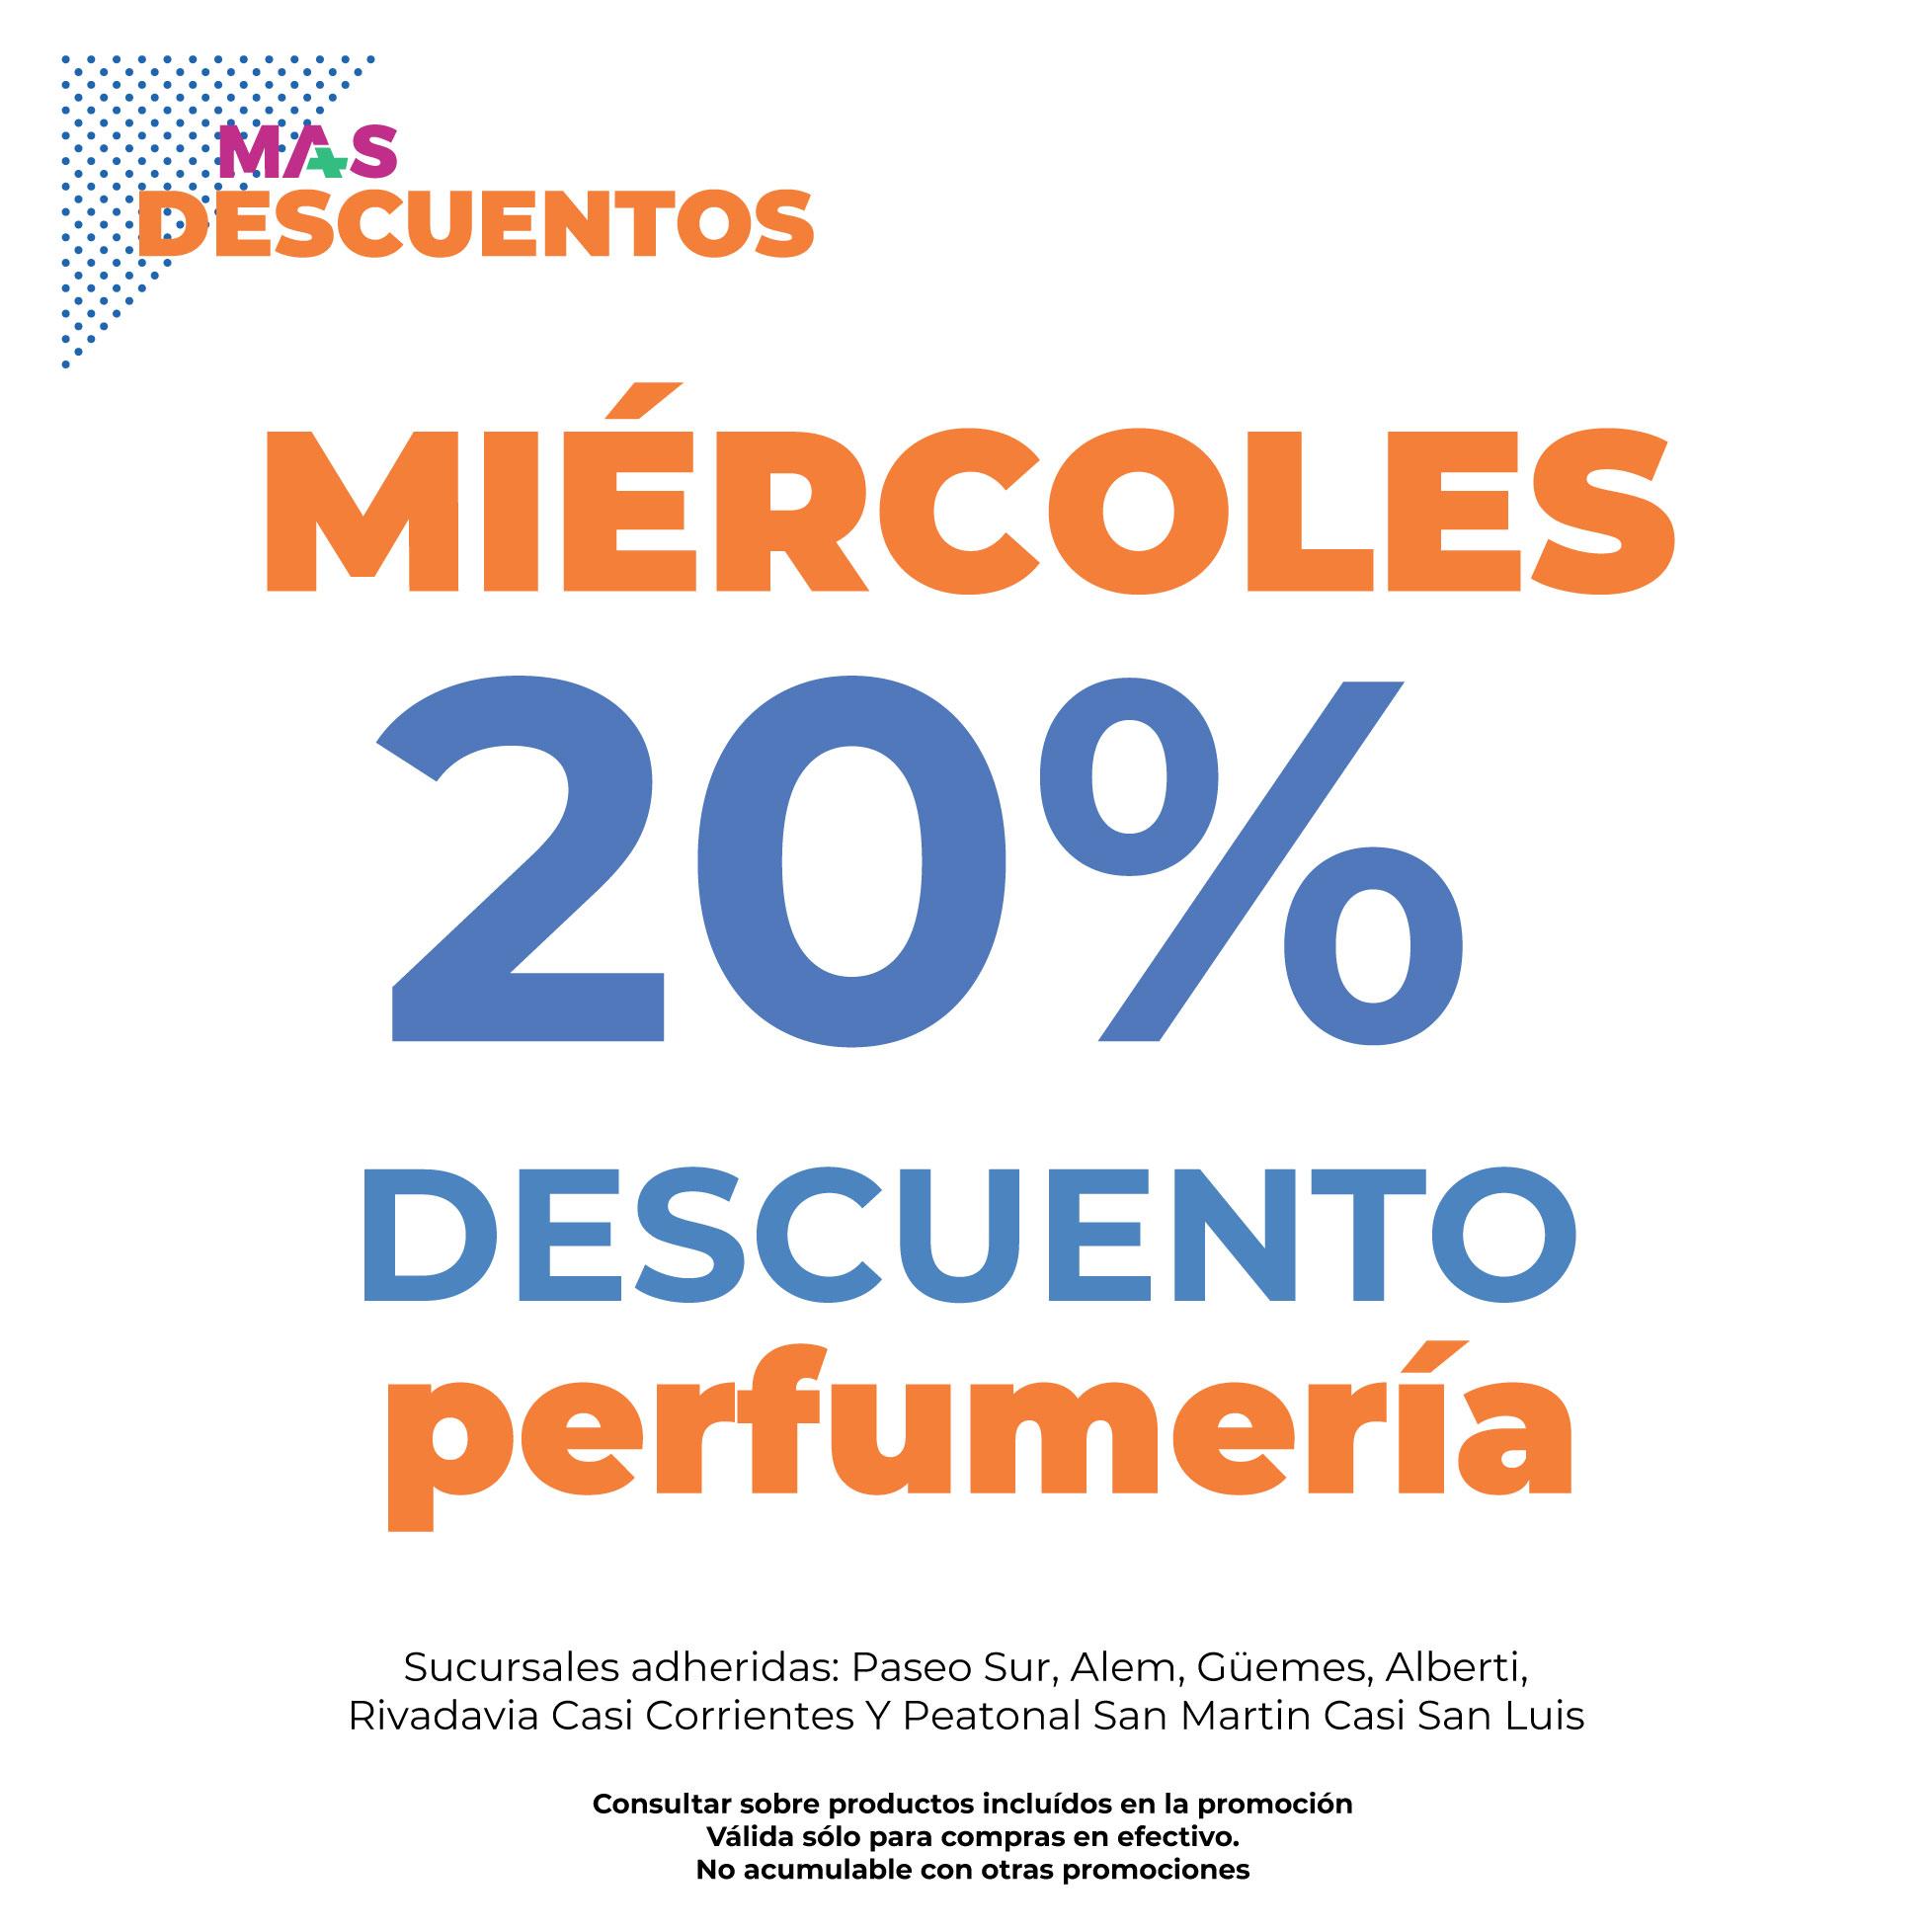 miercoels